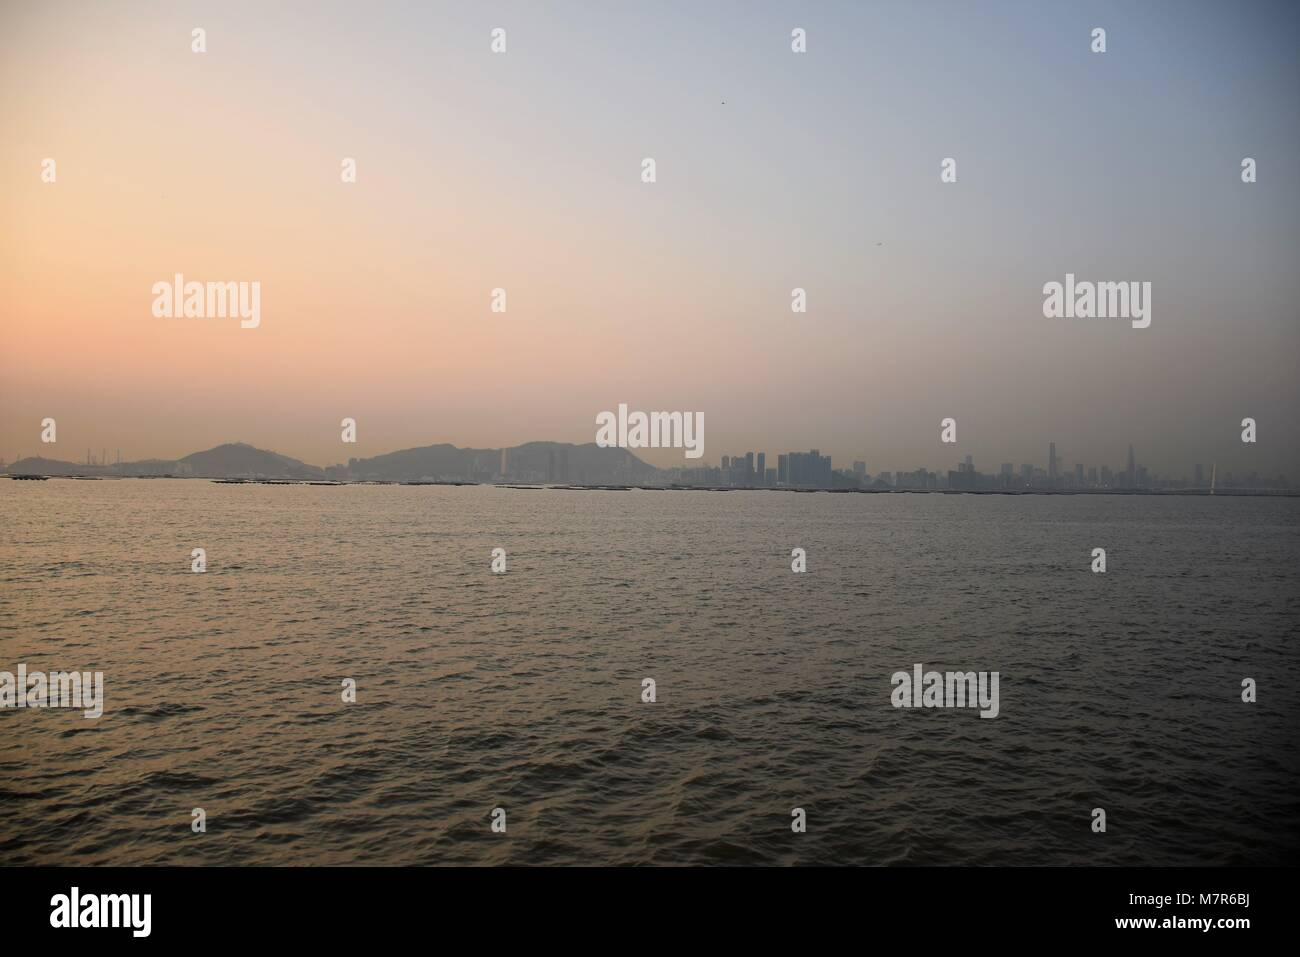 Sunset in Shenzhen bay seen from New Territories, Hong Kong Stock Photo